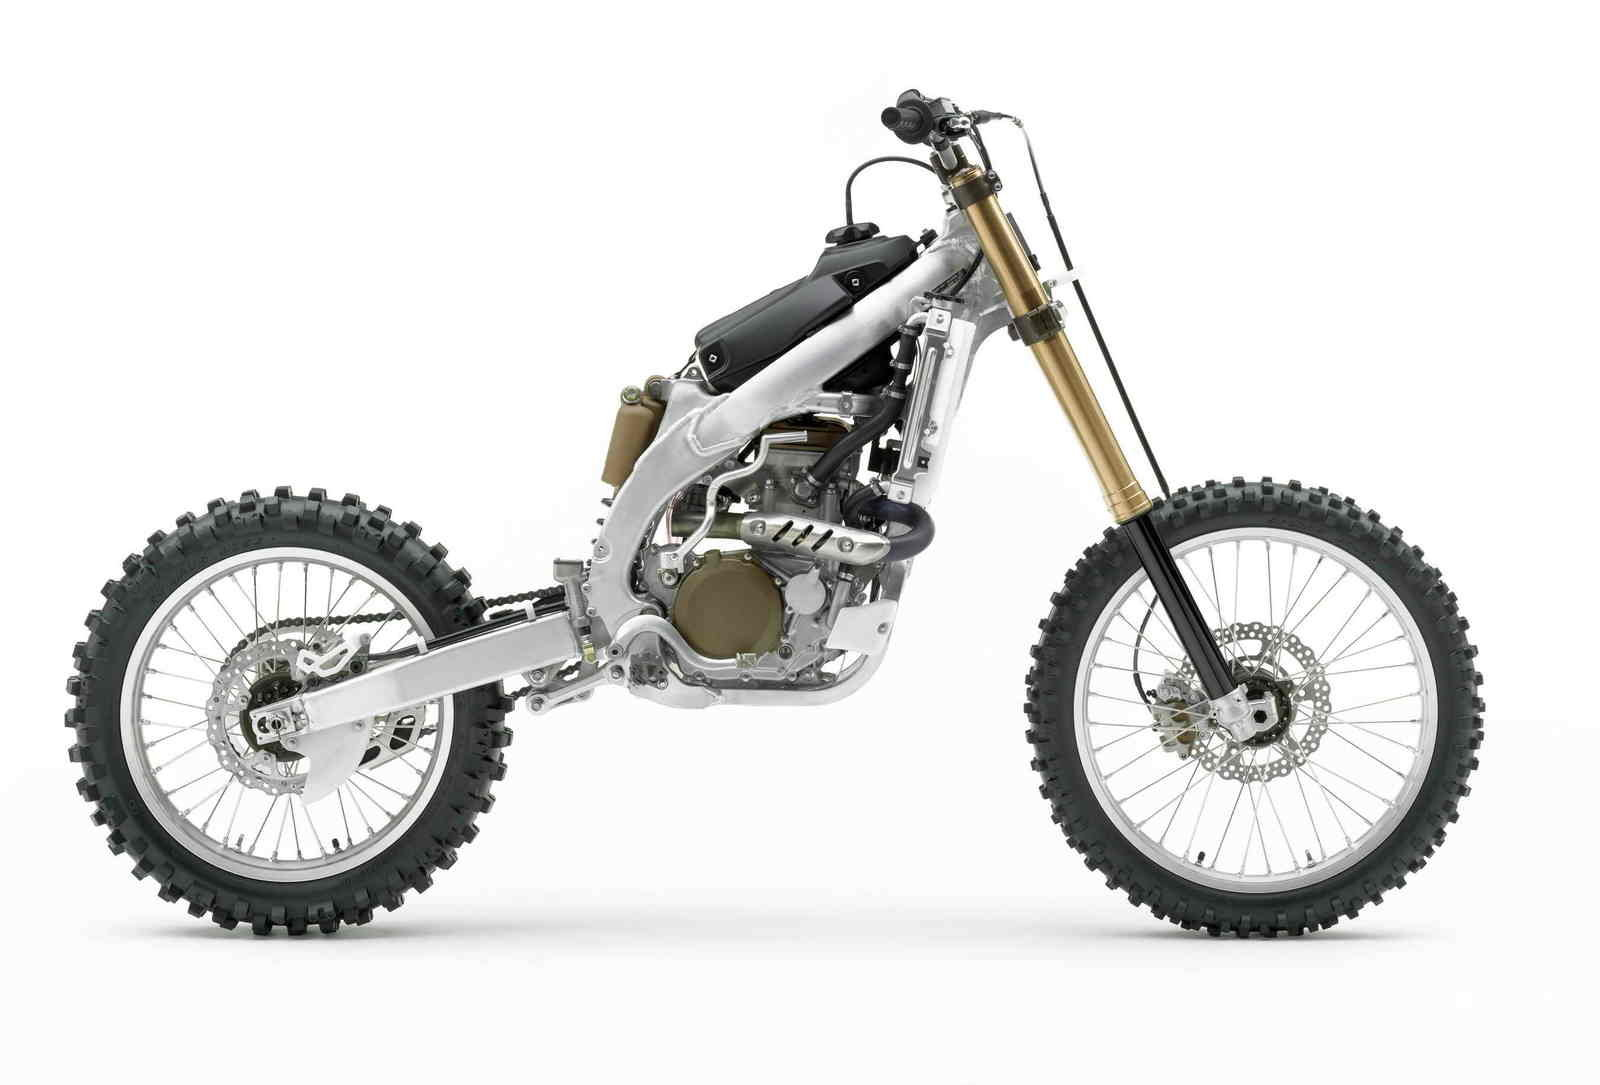 Honda Road Star Motorcycle